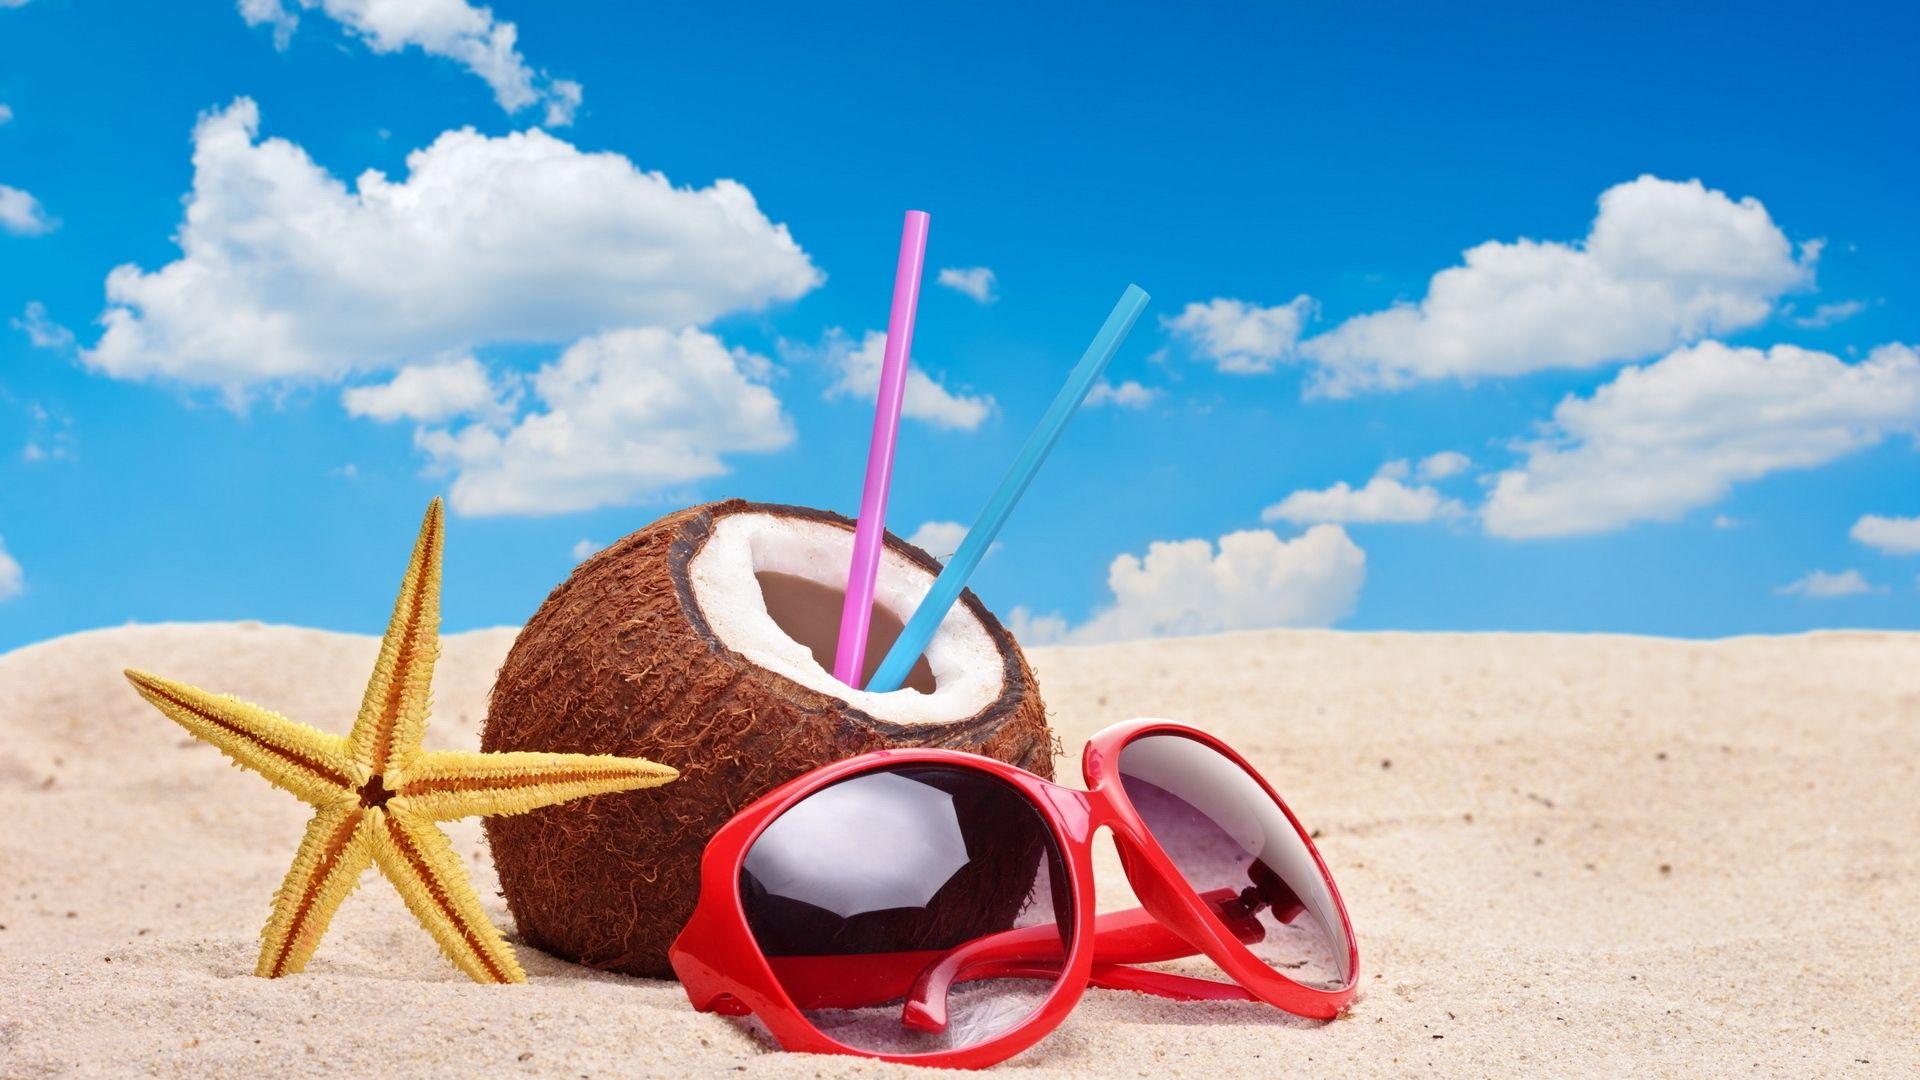 Best 25 Summer Desktop Backgrounds Ideas On Pinterest: Summer Pictures For Desktop